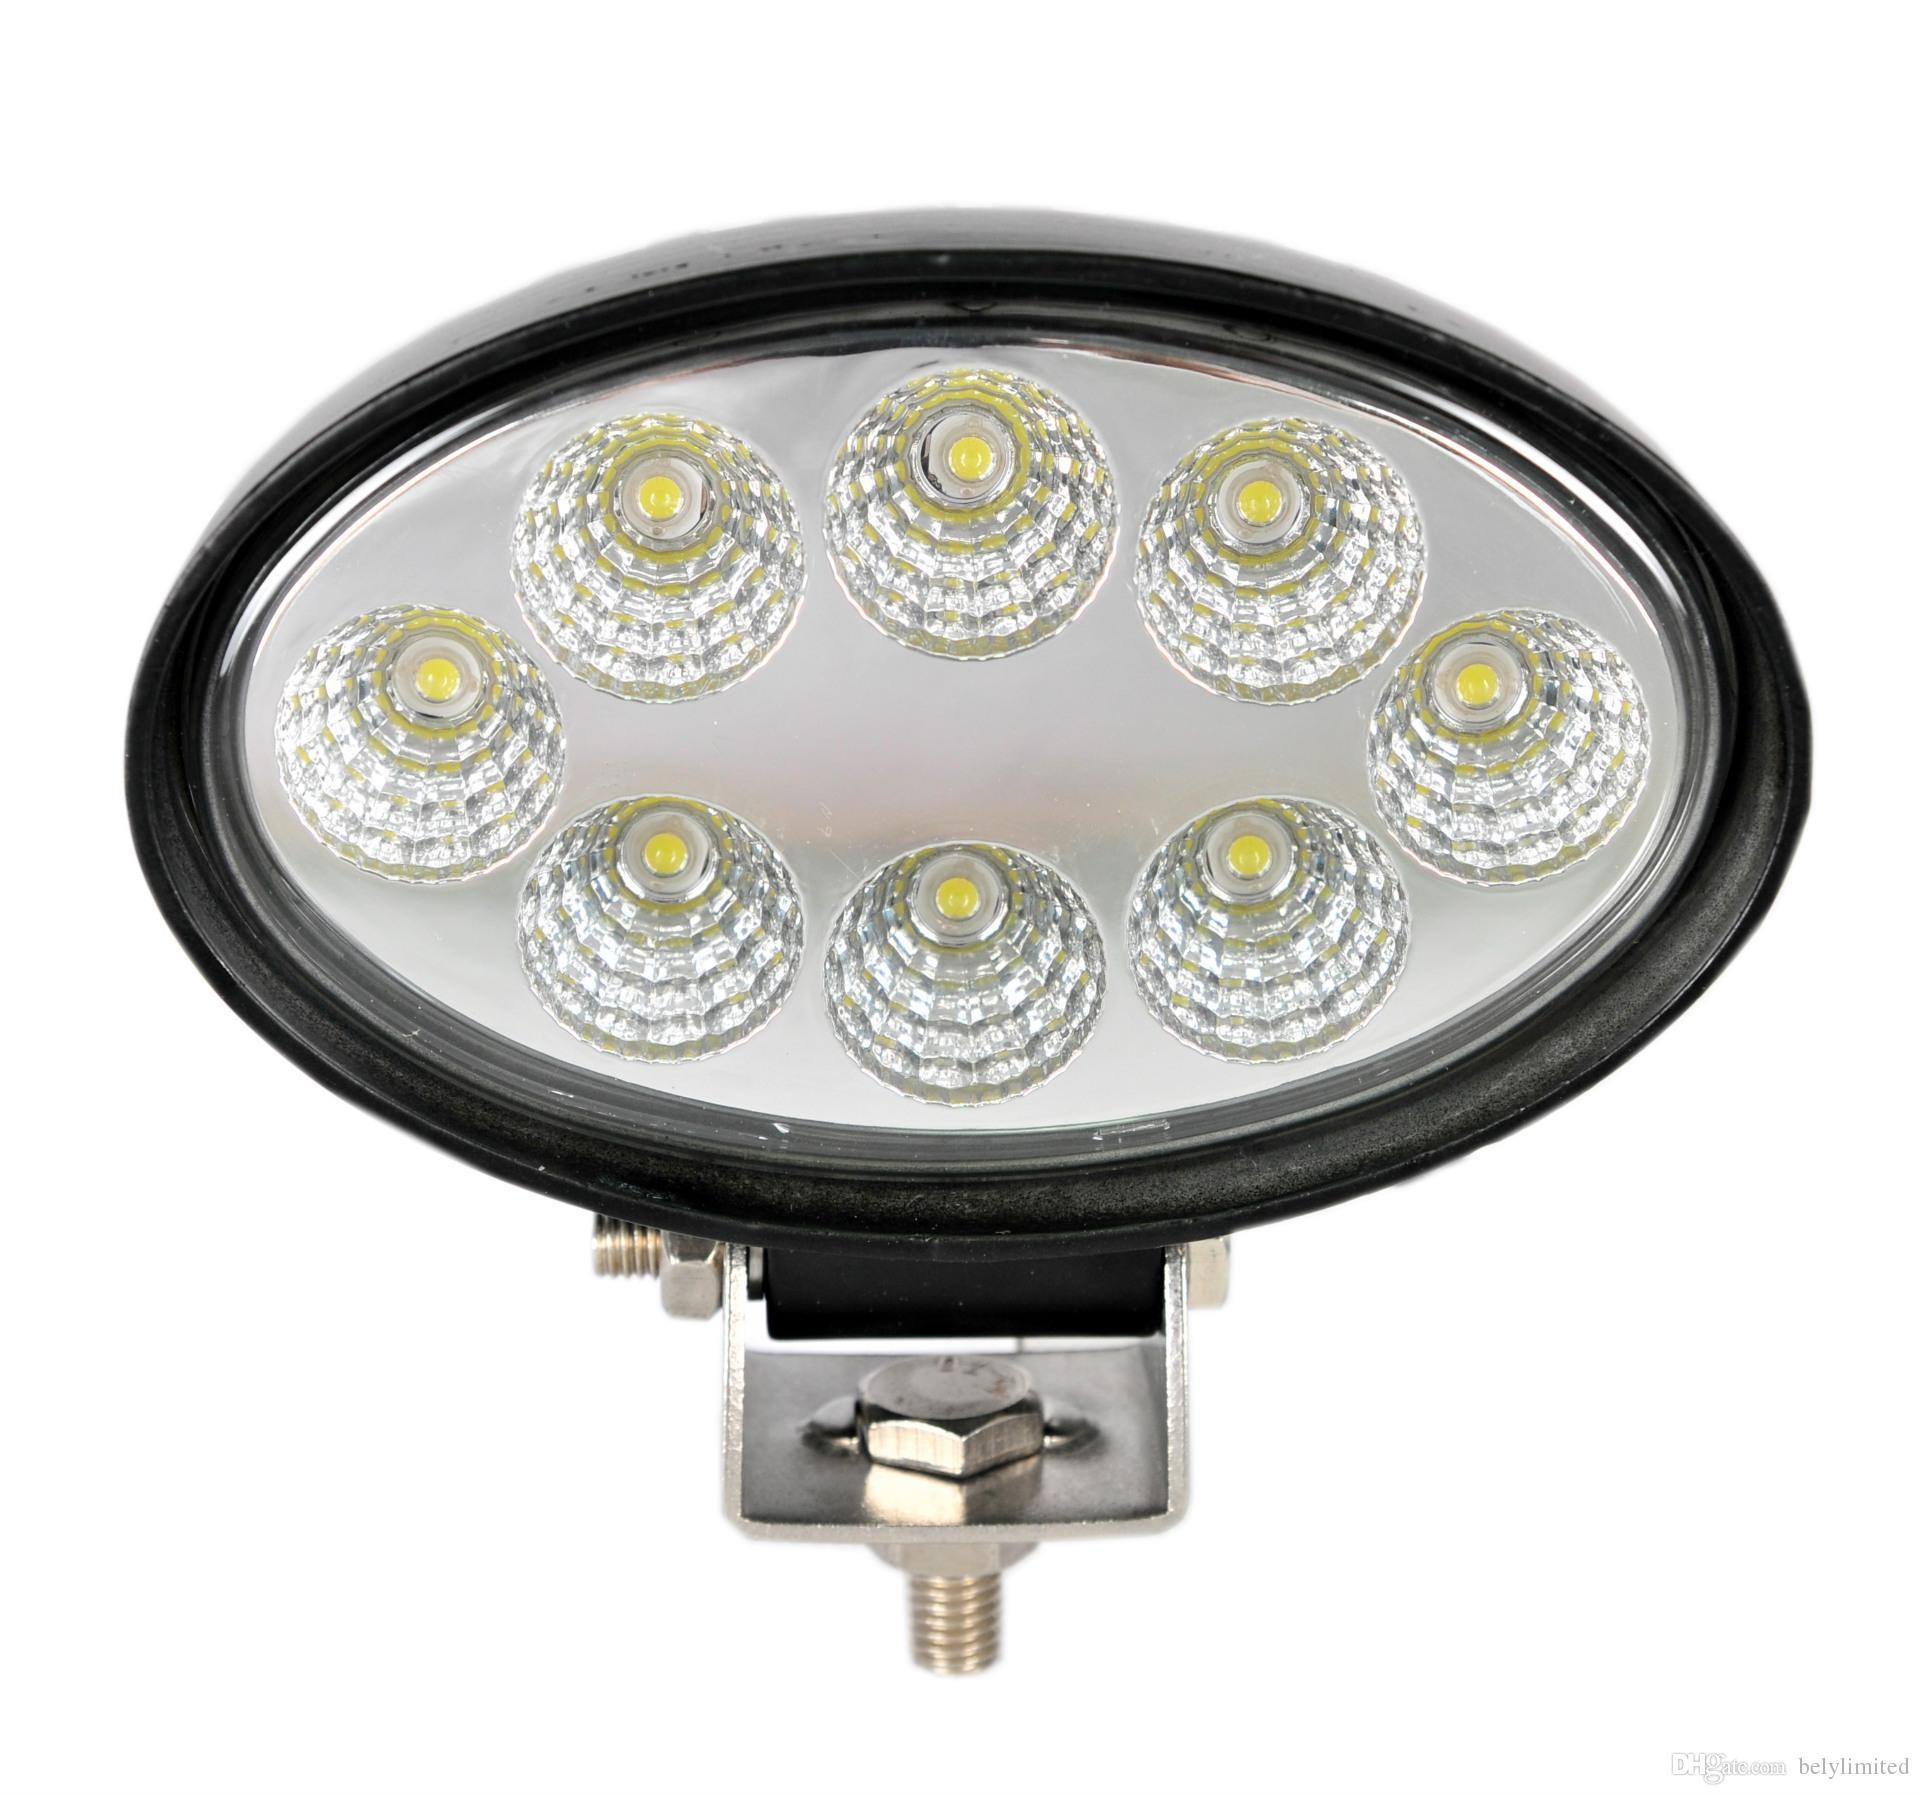 big sale led car light, work led light for fog Driving offroad boat lamp ATV SUV Round/Spot, 24w led work light